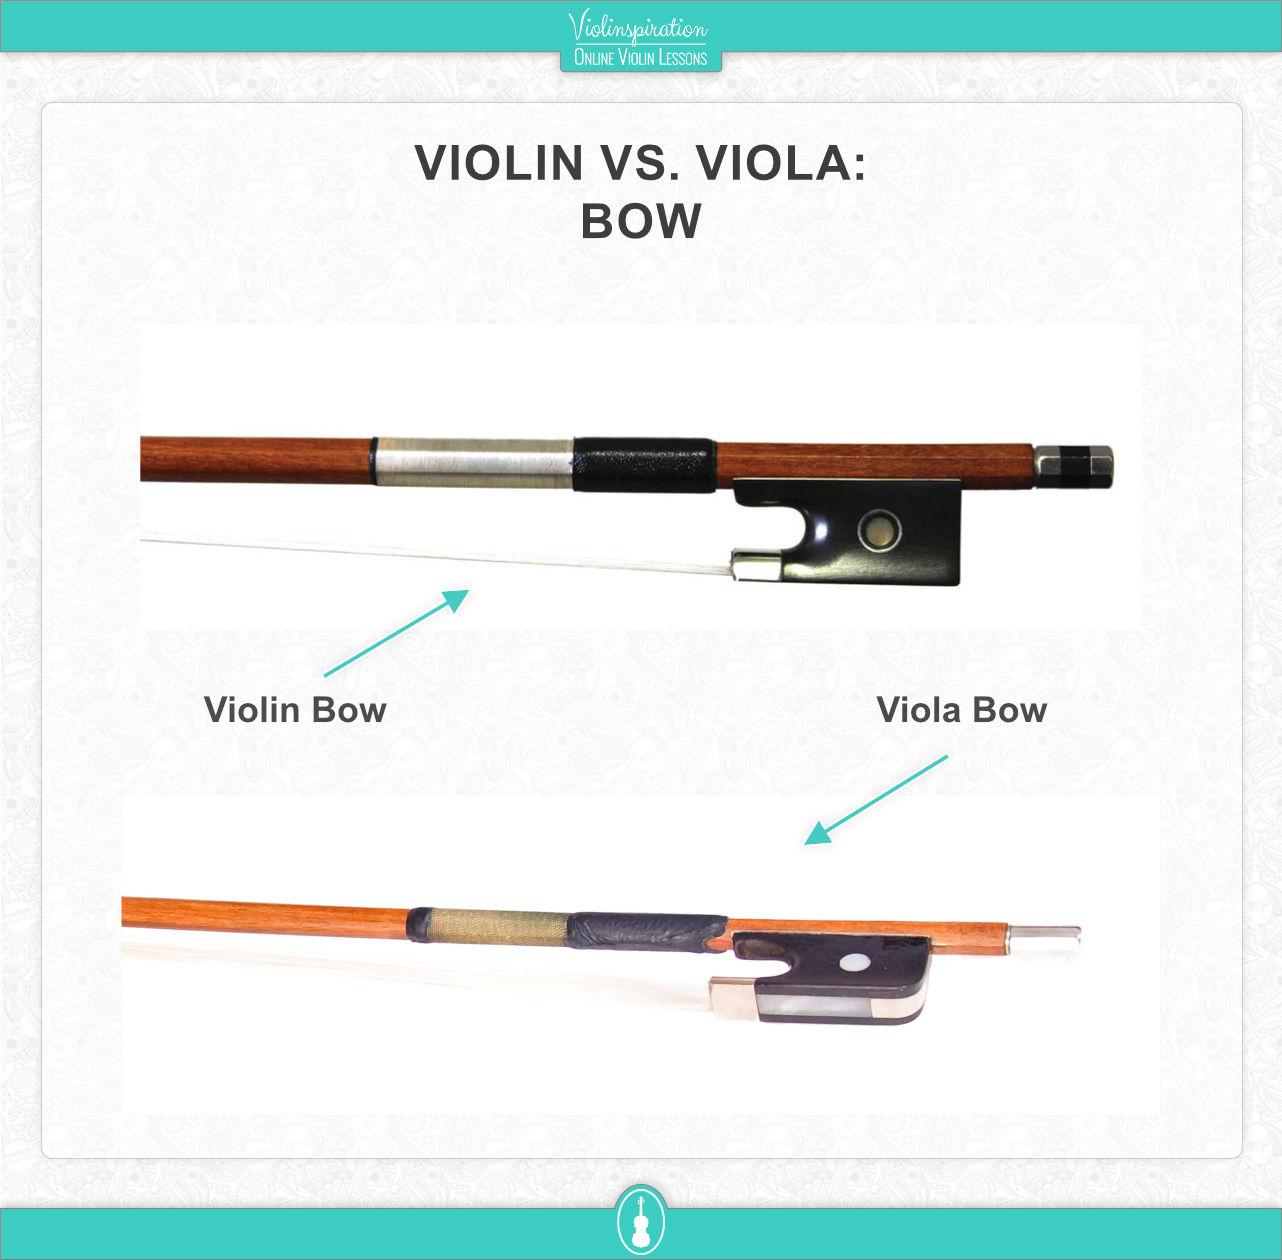 Violin vs viola - bow